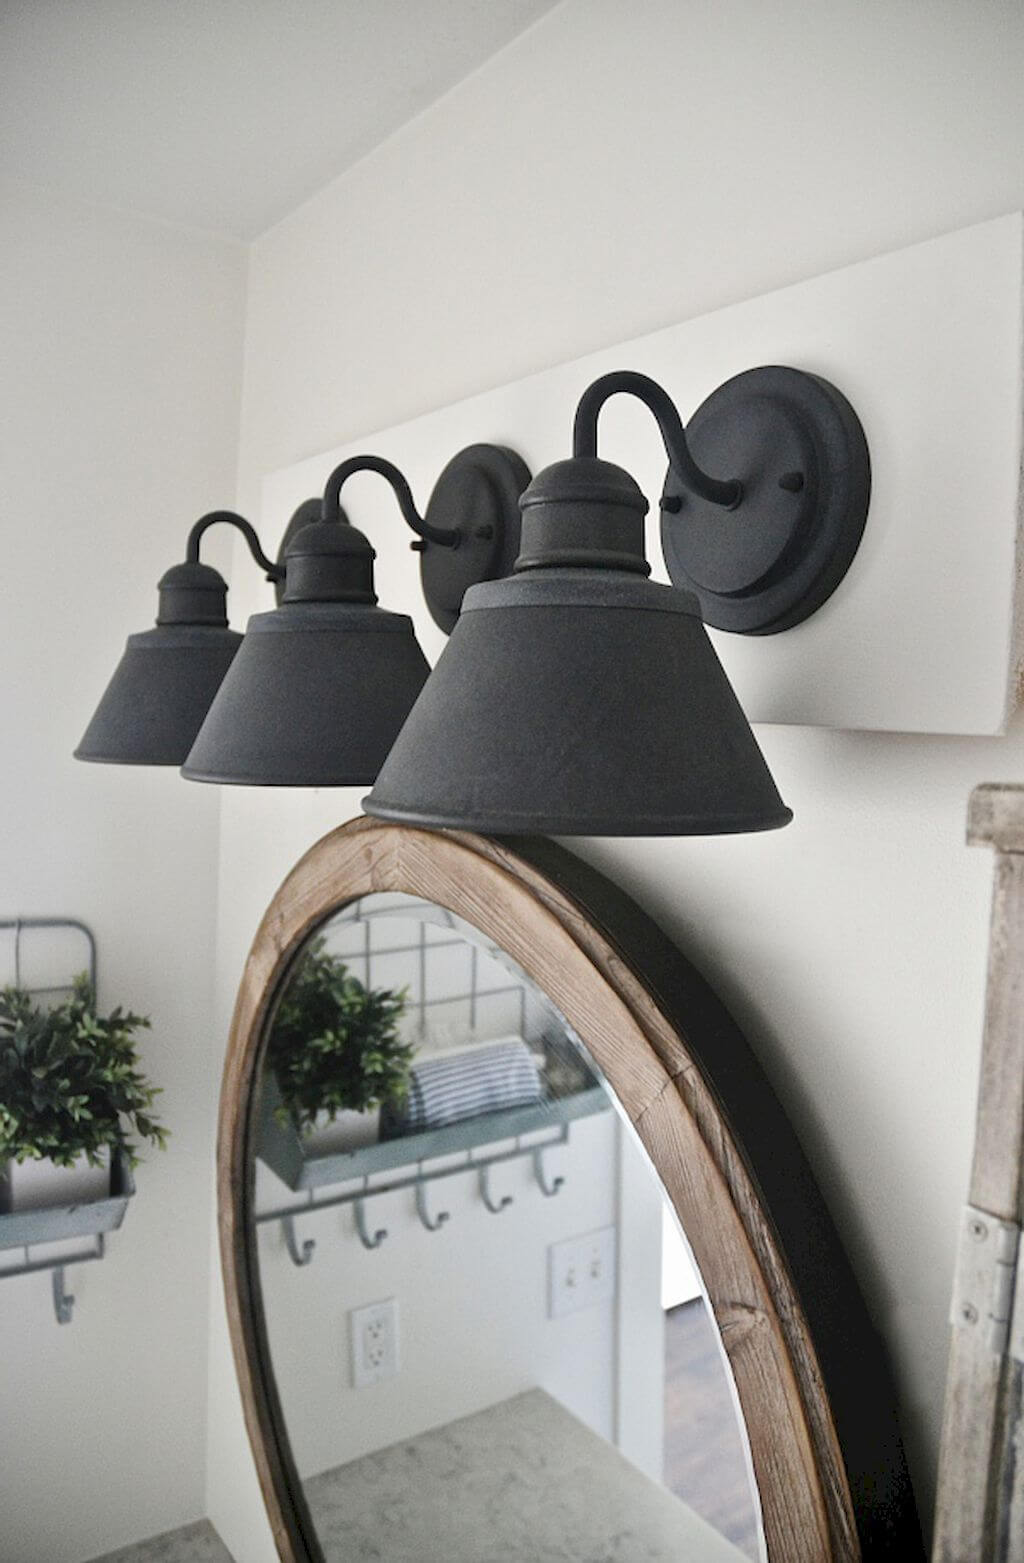 Matte Black Gooseneck Light Post Bathroom Fixture